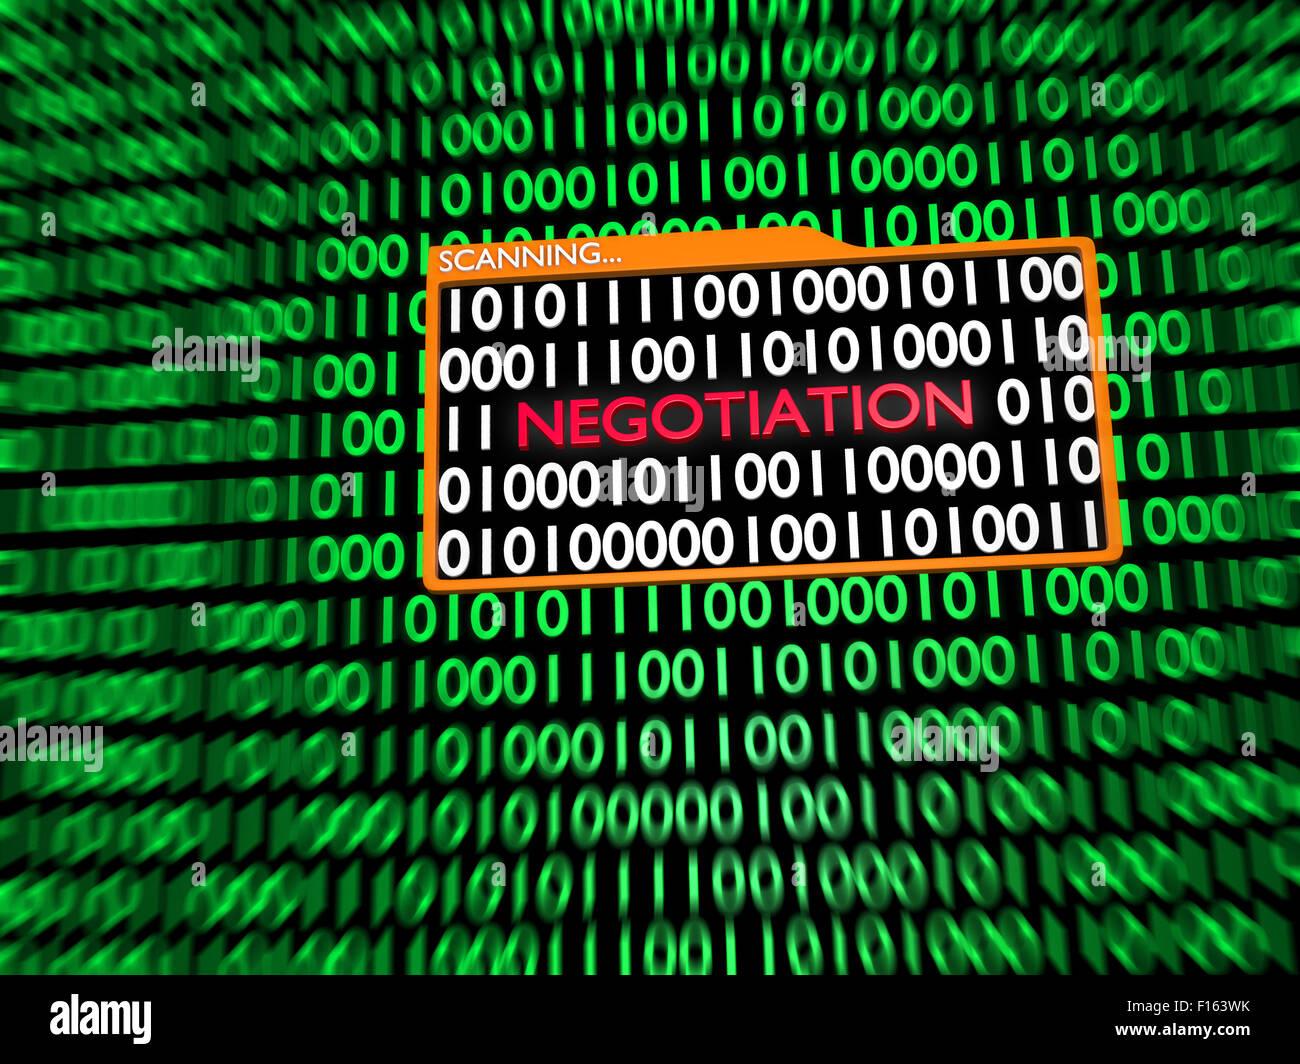 Scanning Hidden Digital Negotiation into Binary Digits - Stock Image